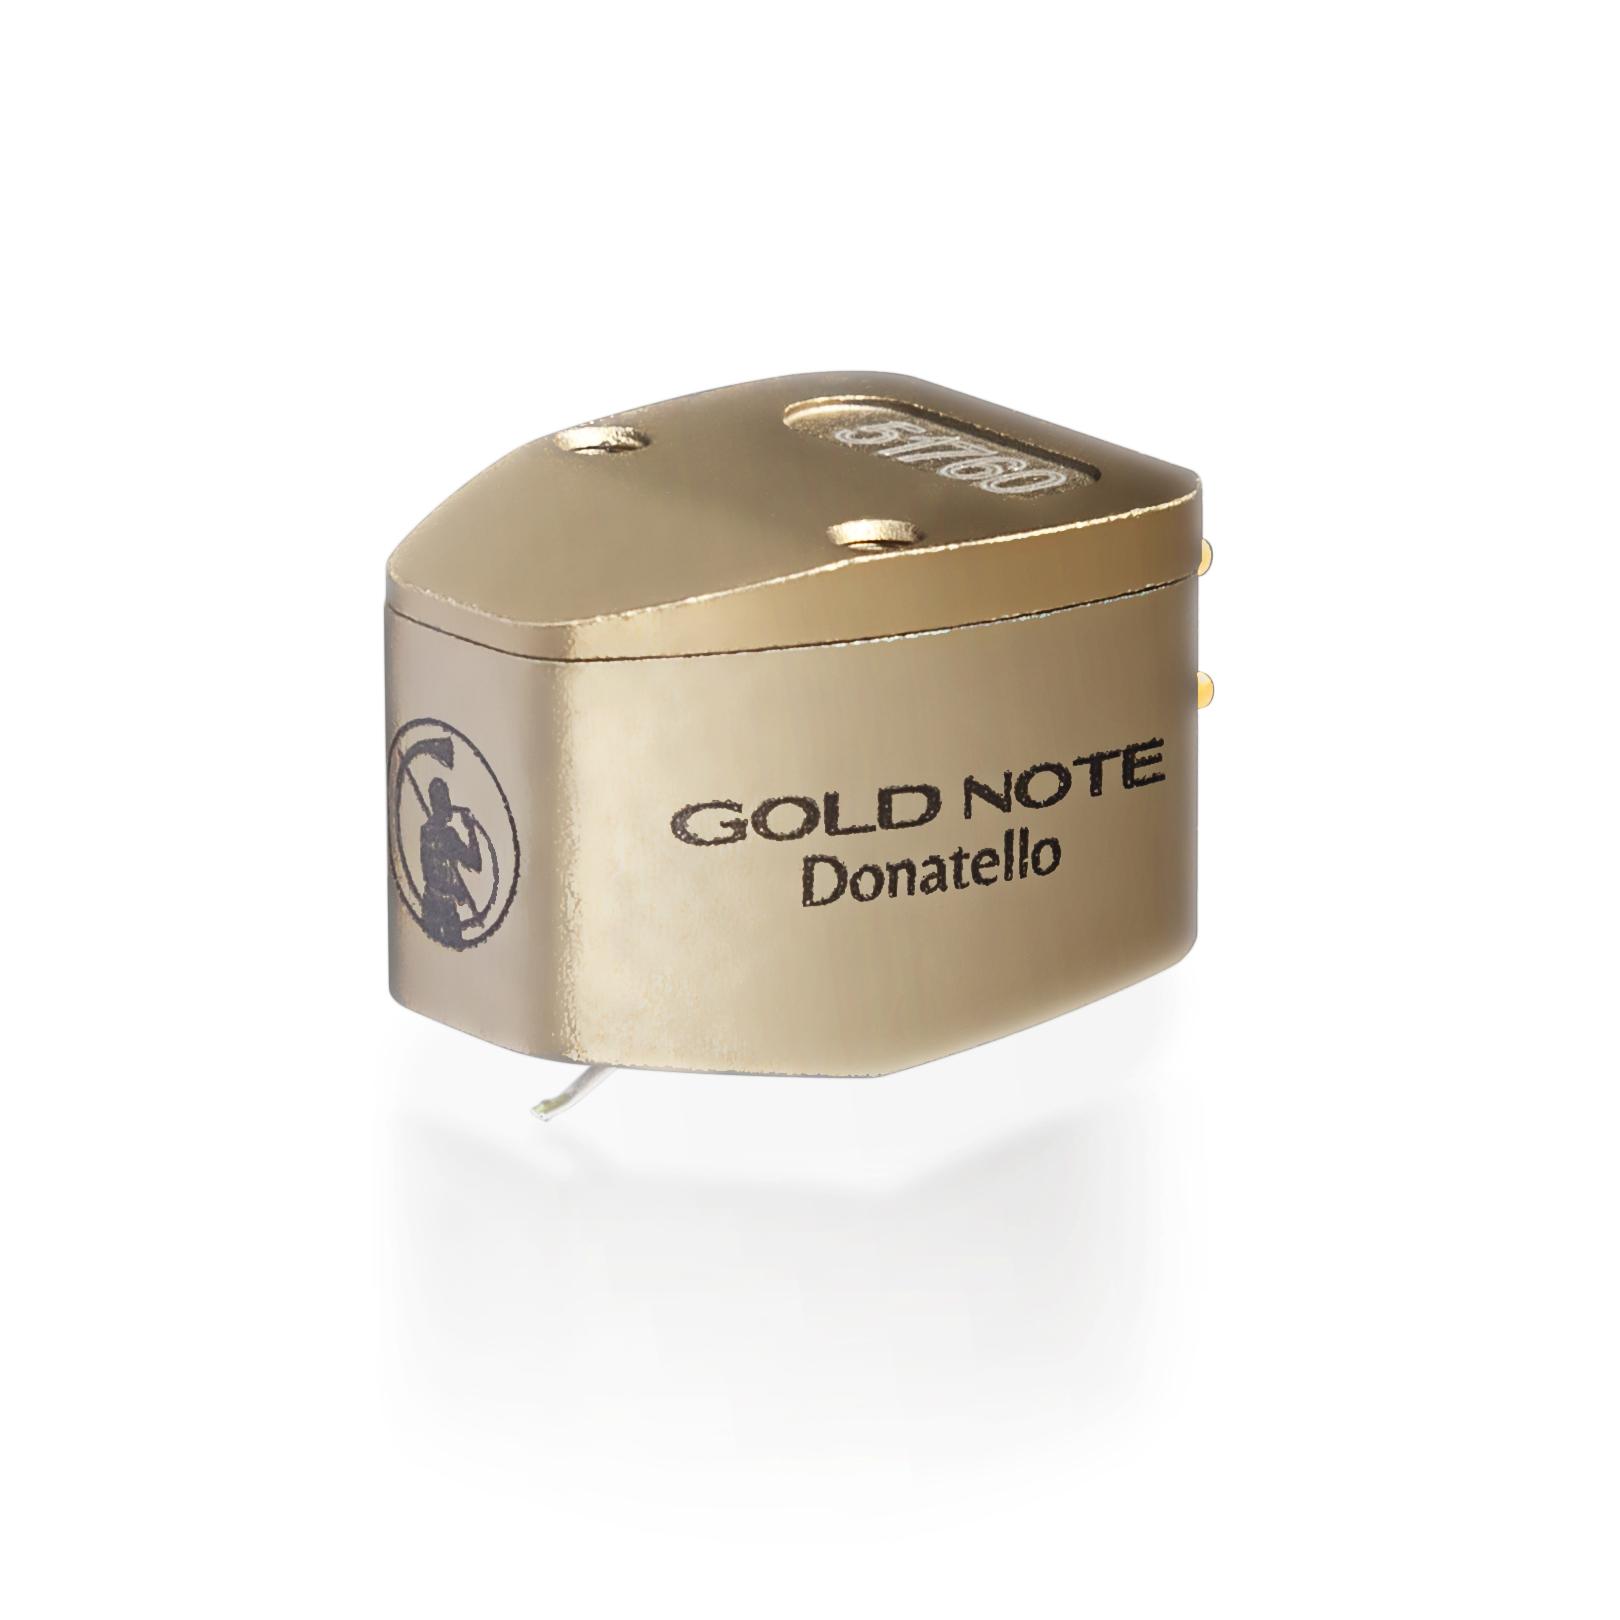 Donatello 1 gold on white.jpg